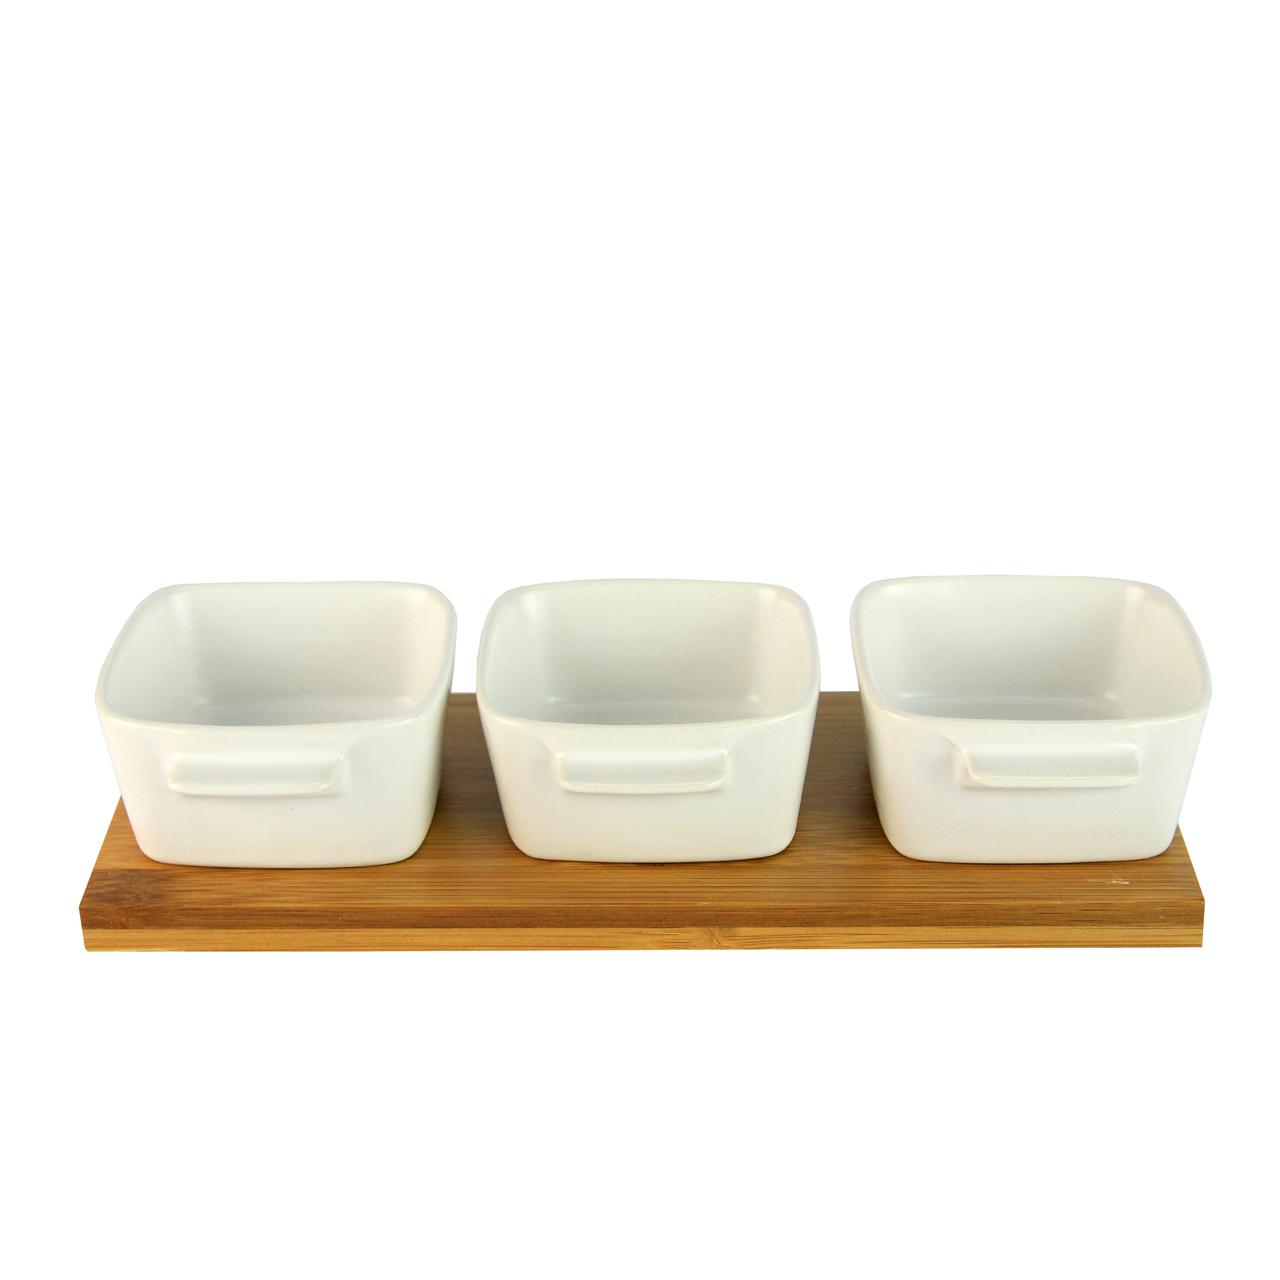 Tava Din Bambus Cu 3 Recipiente Din Ceramica Alba